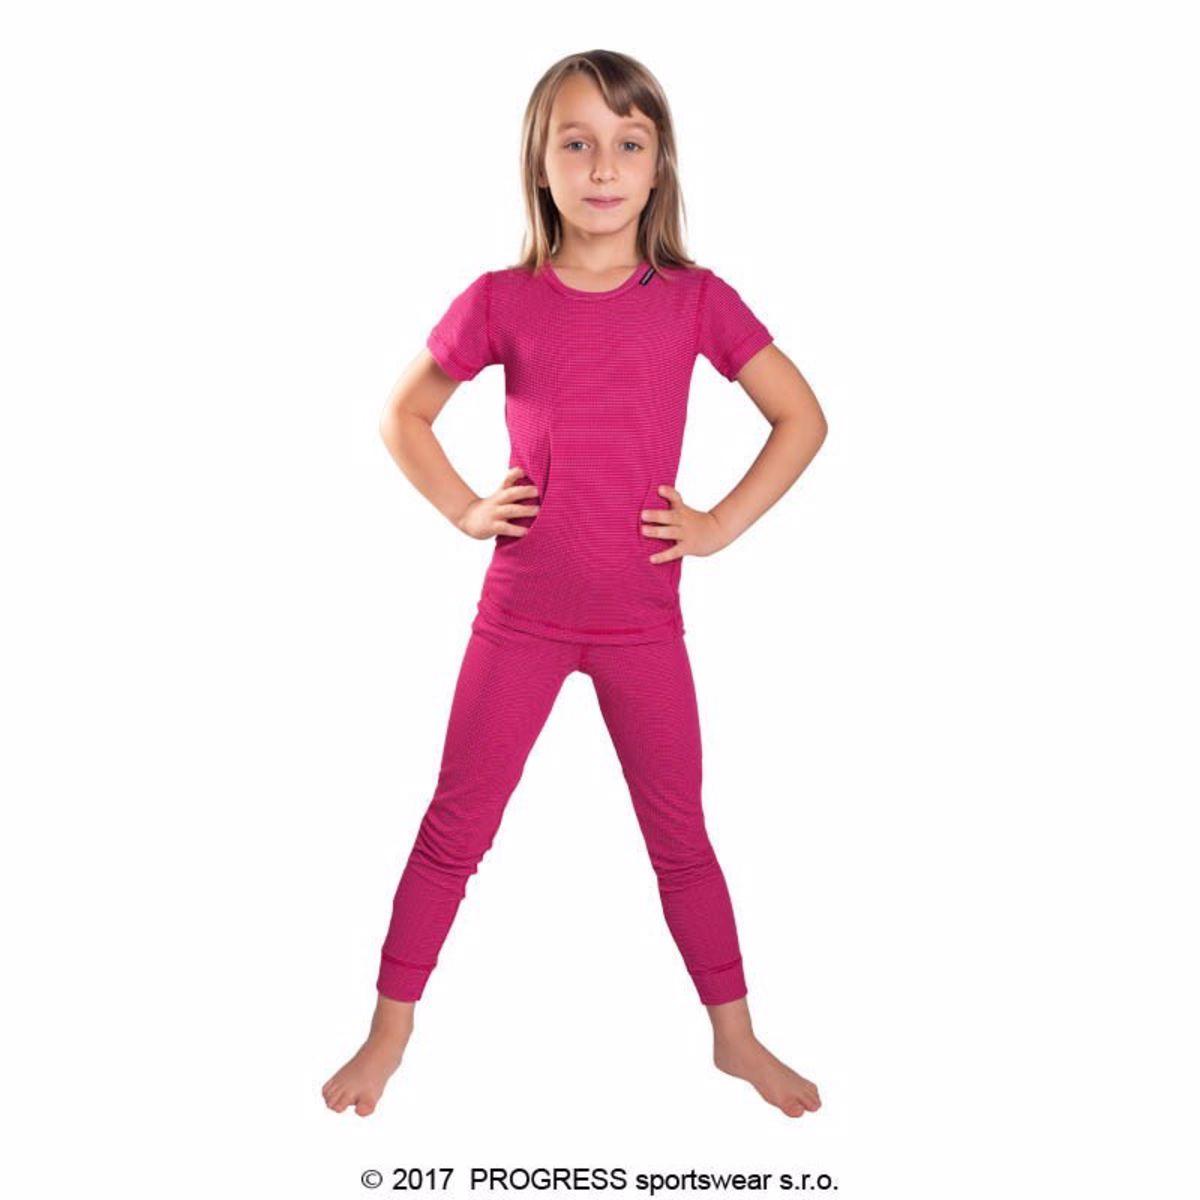 3856e0310aed Progress DT MS NKRD detské termo krátky rukáv